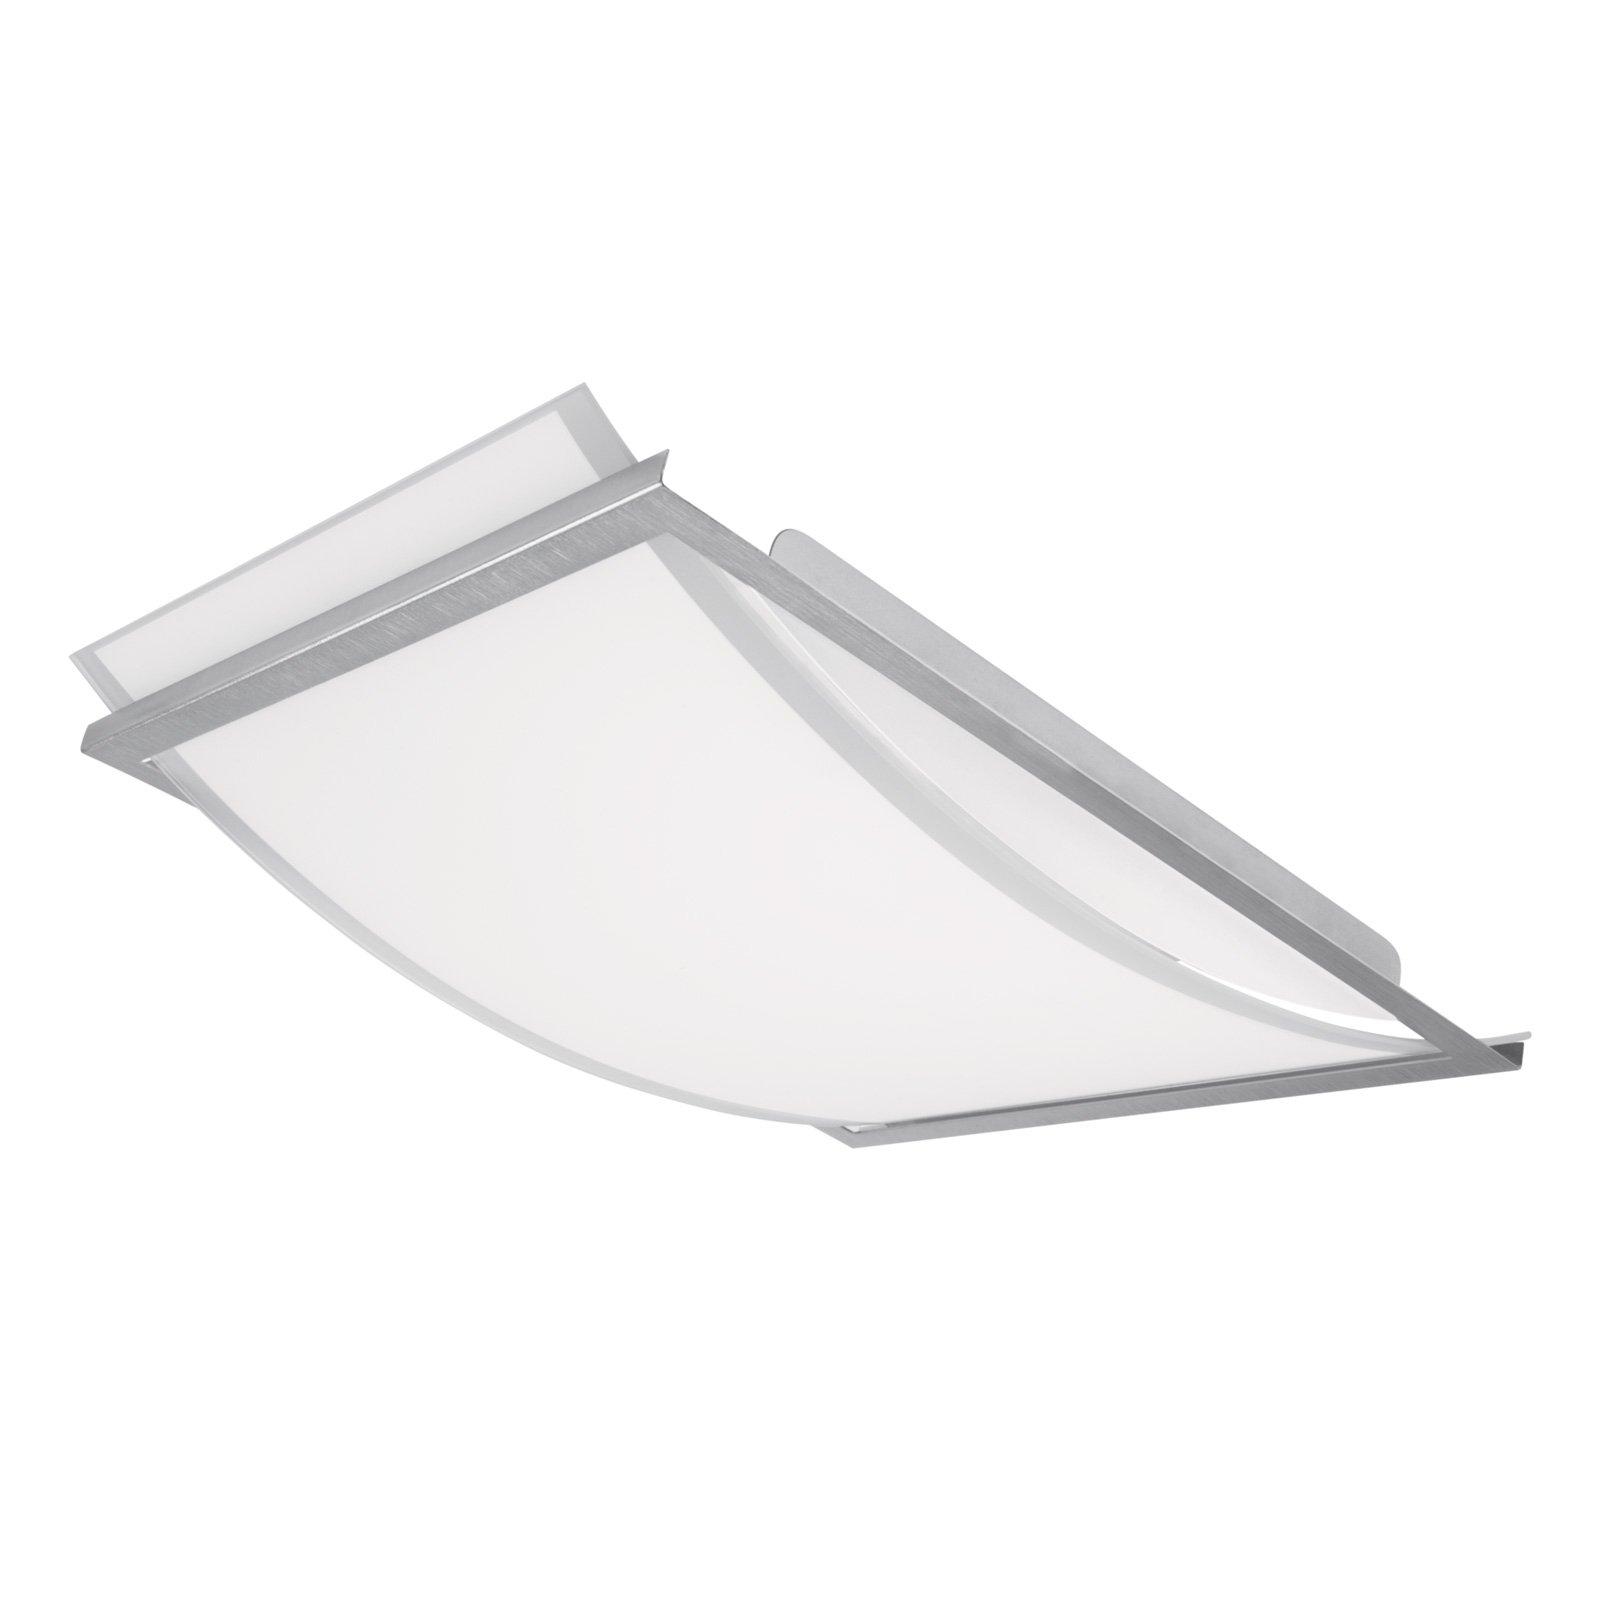 LEDVANCE Lunive Arc LED-taklampe 39x30 3 000 K